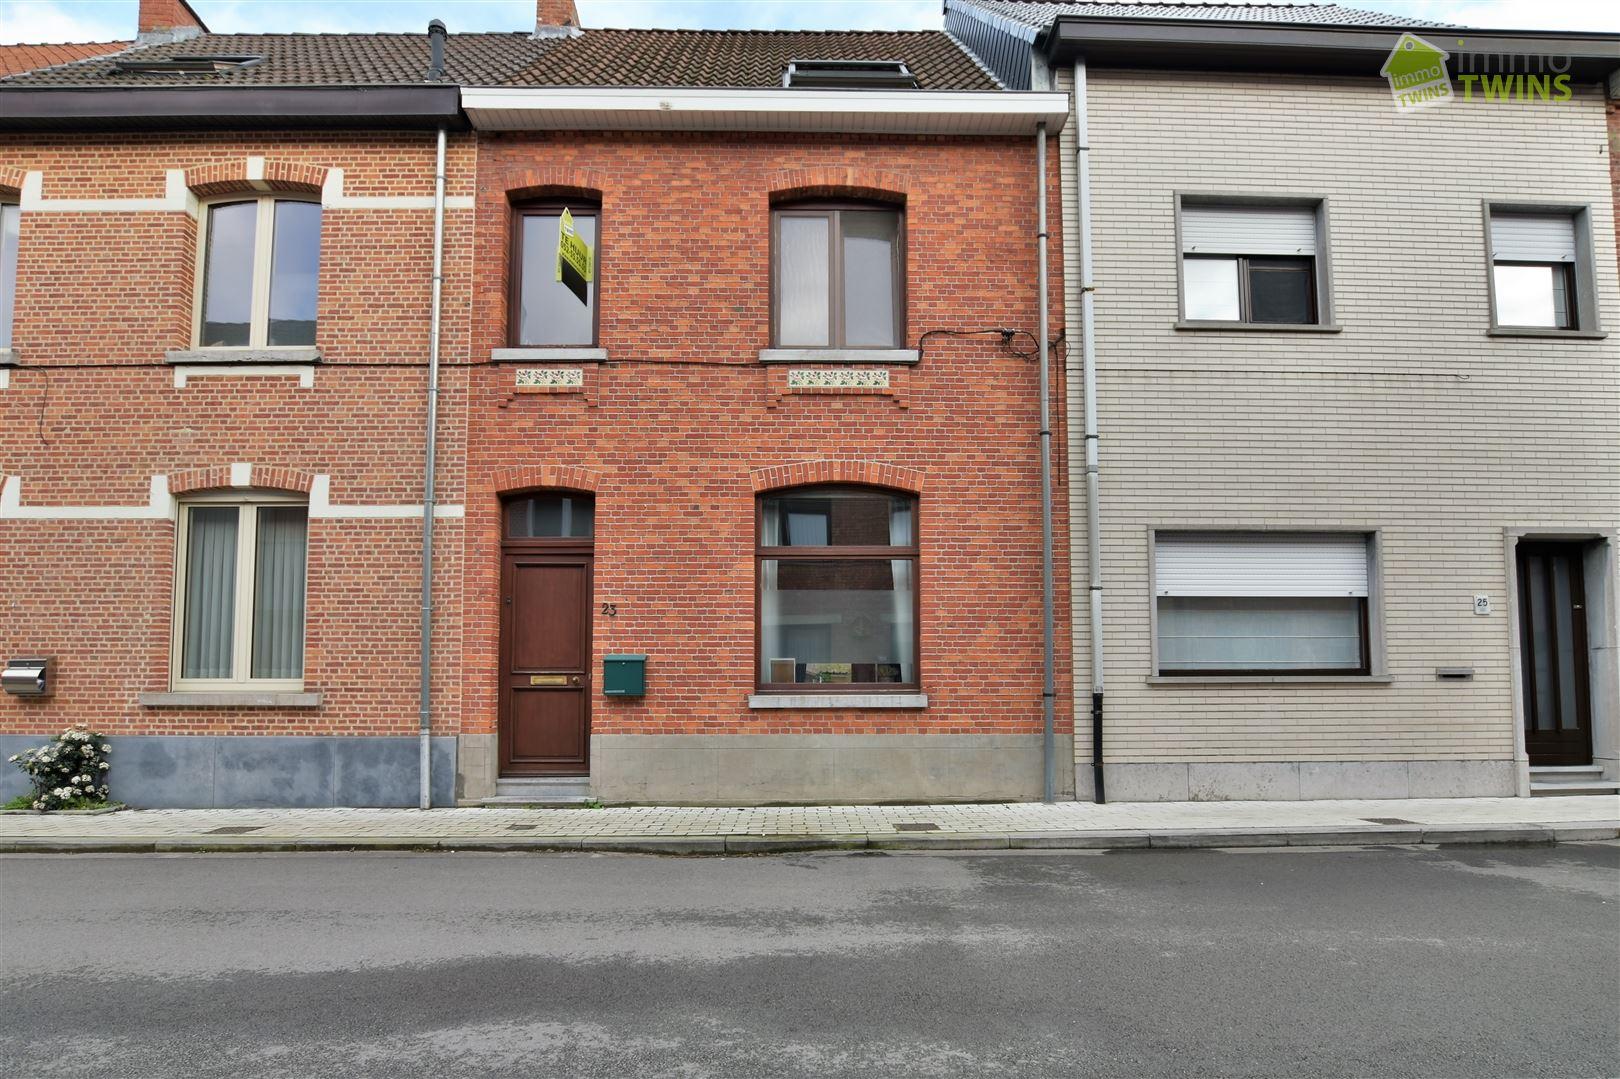 Foto 15 : Woning te 9200 SINT-GILLIS-BIJ-DENDERMONDE (België) - Prijs € 710